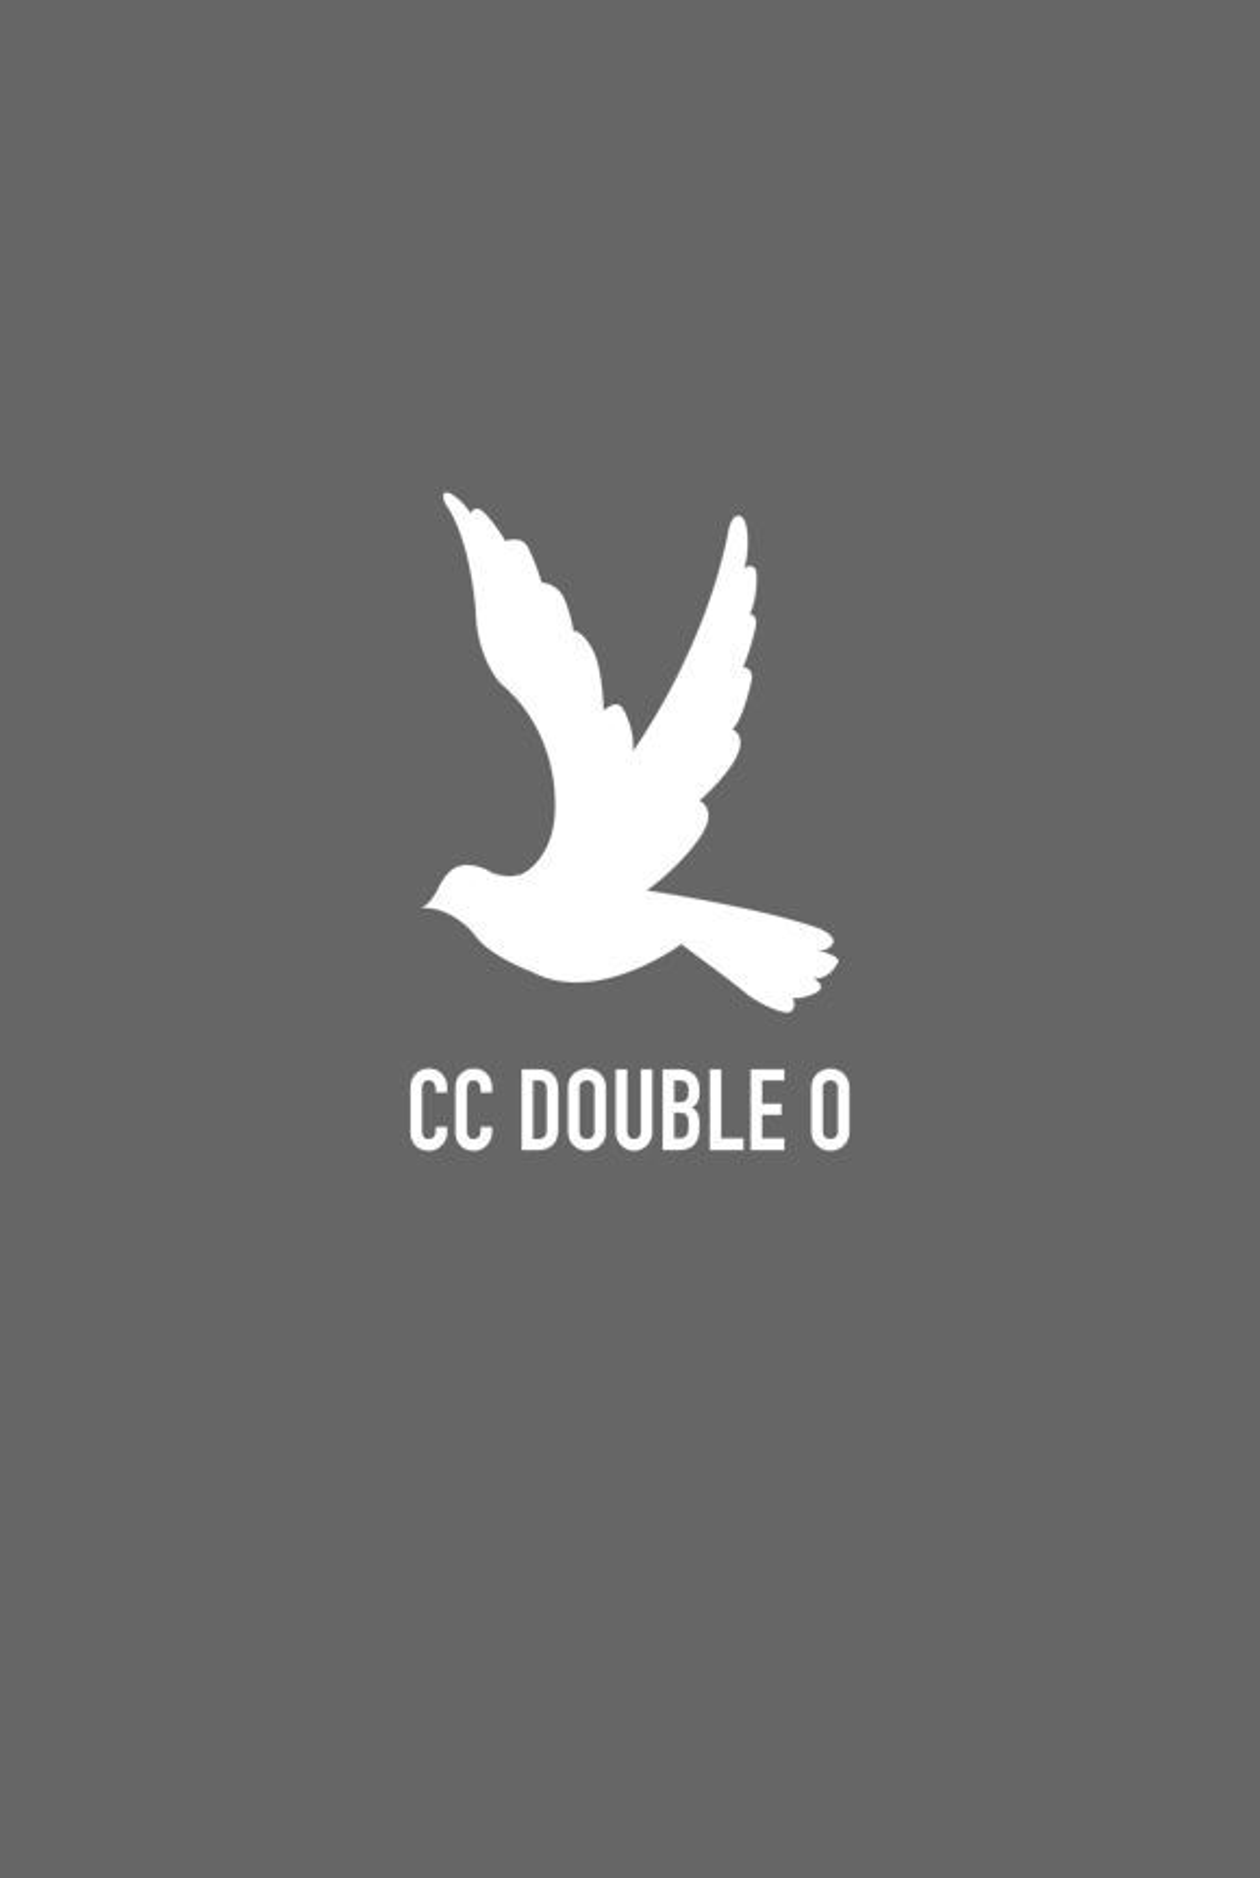 CC DOUBLE O Nylon  Hangbag with Long Strap